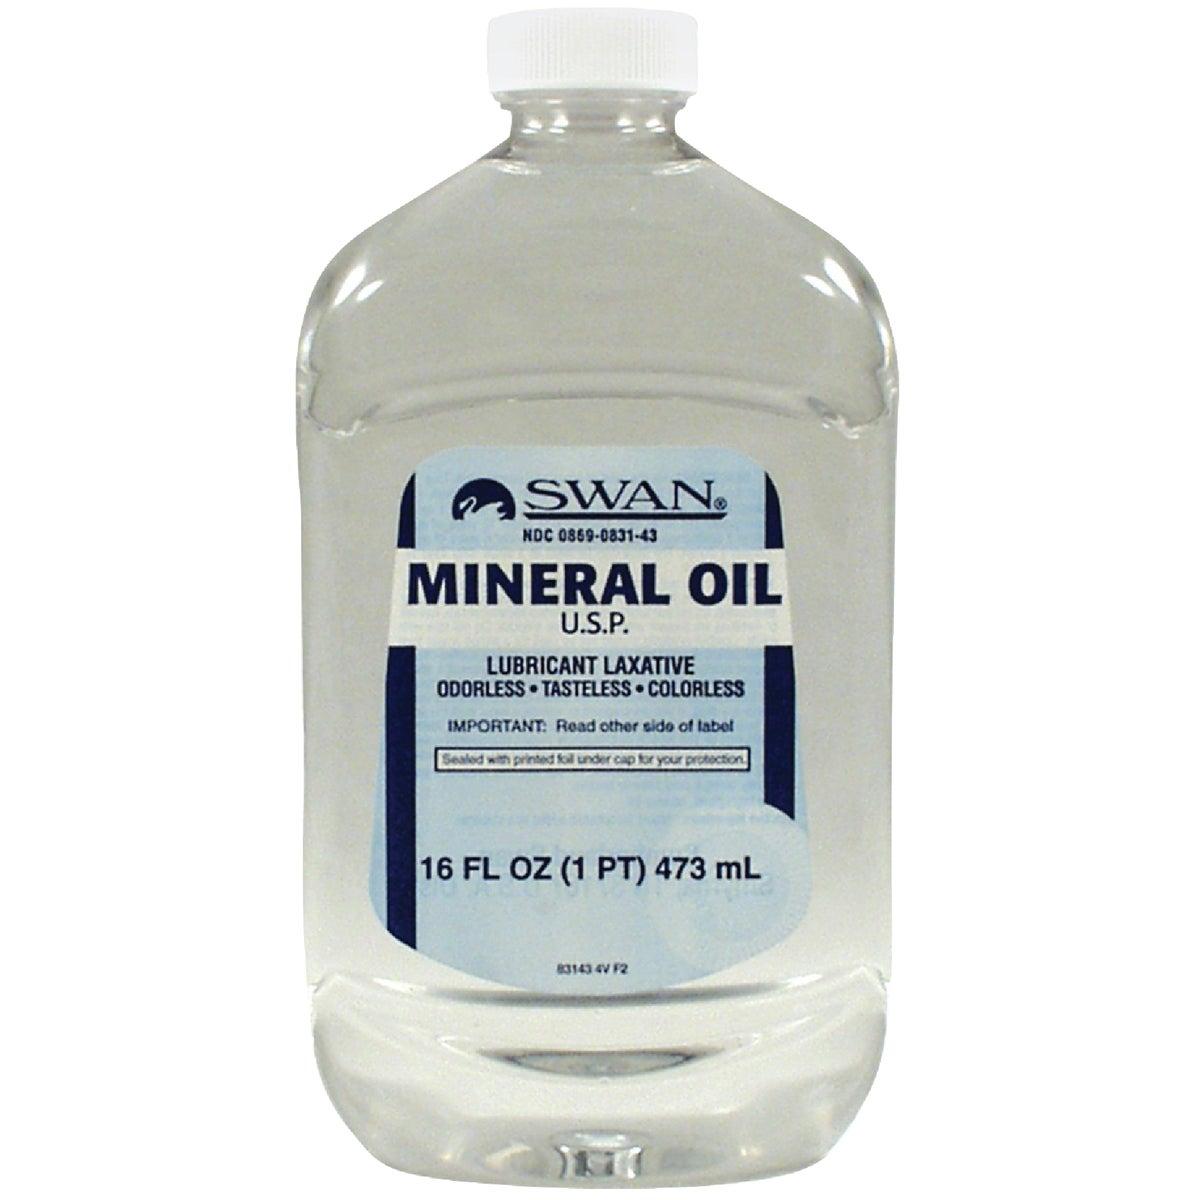 16OZ MINERAL OIL